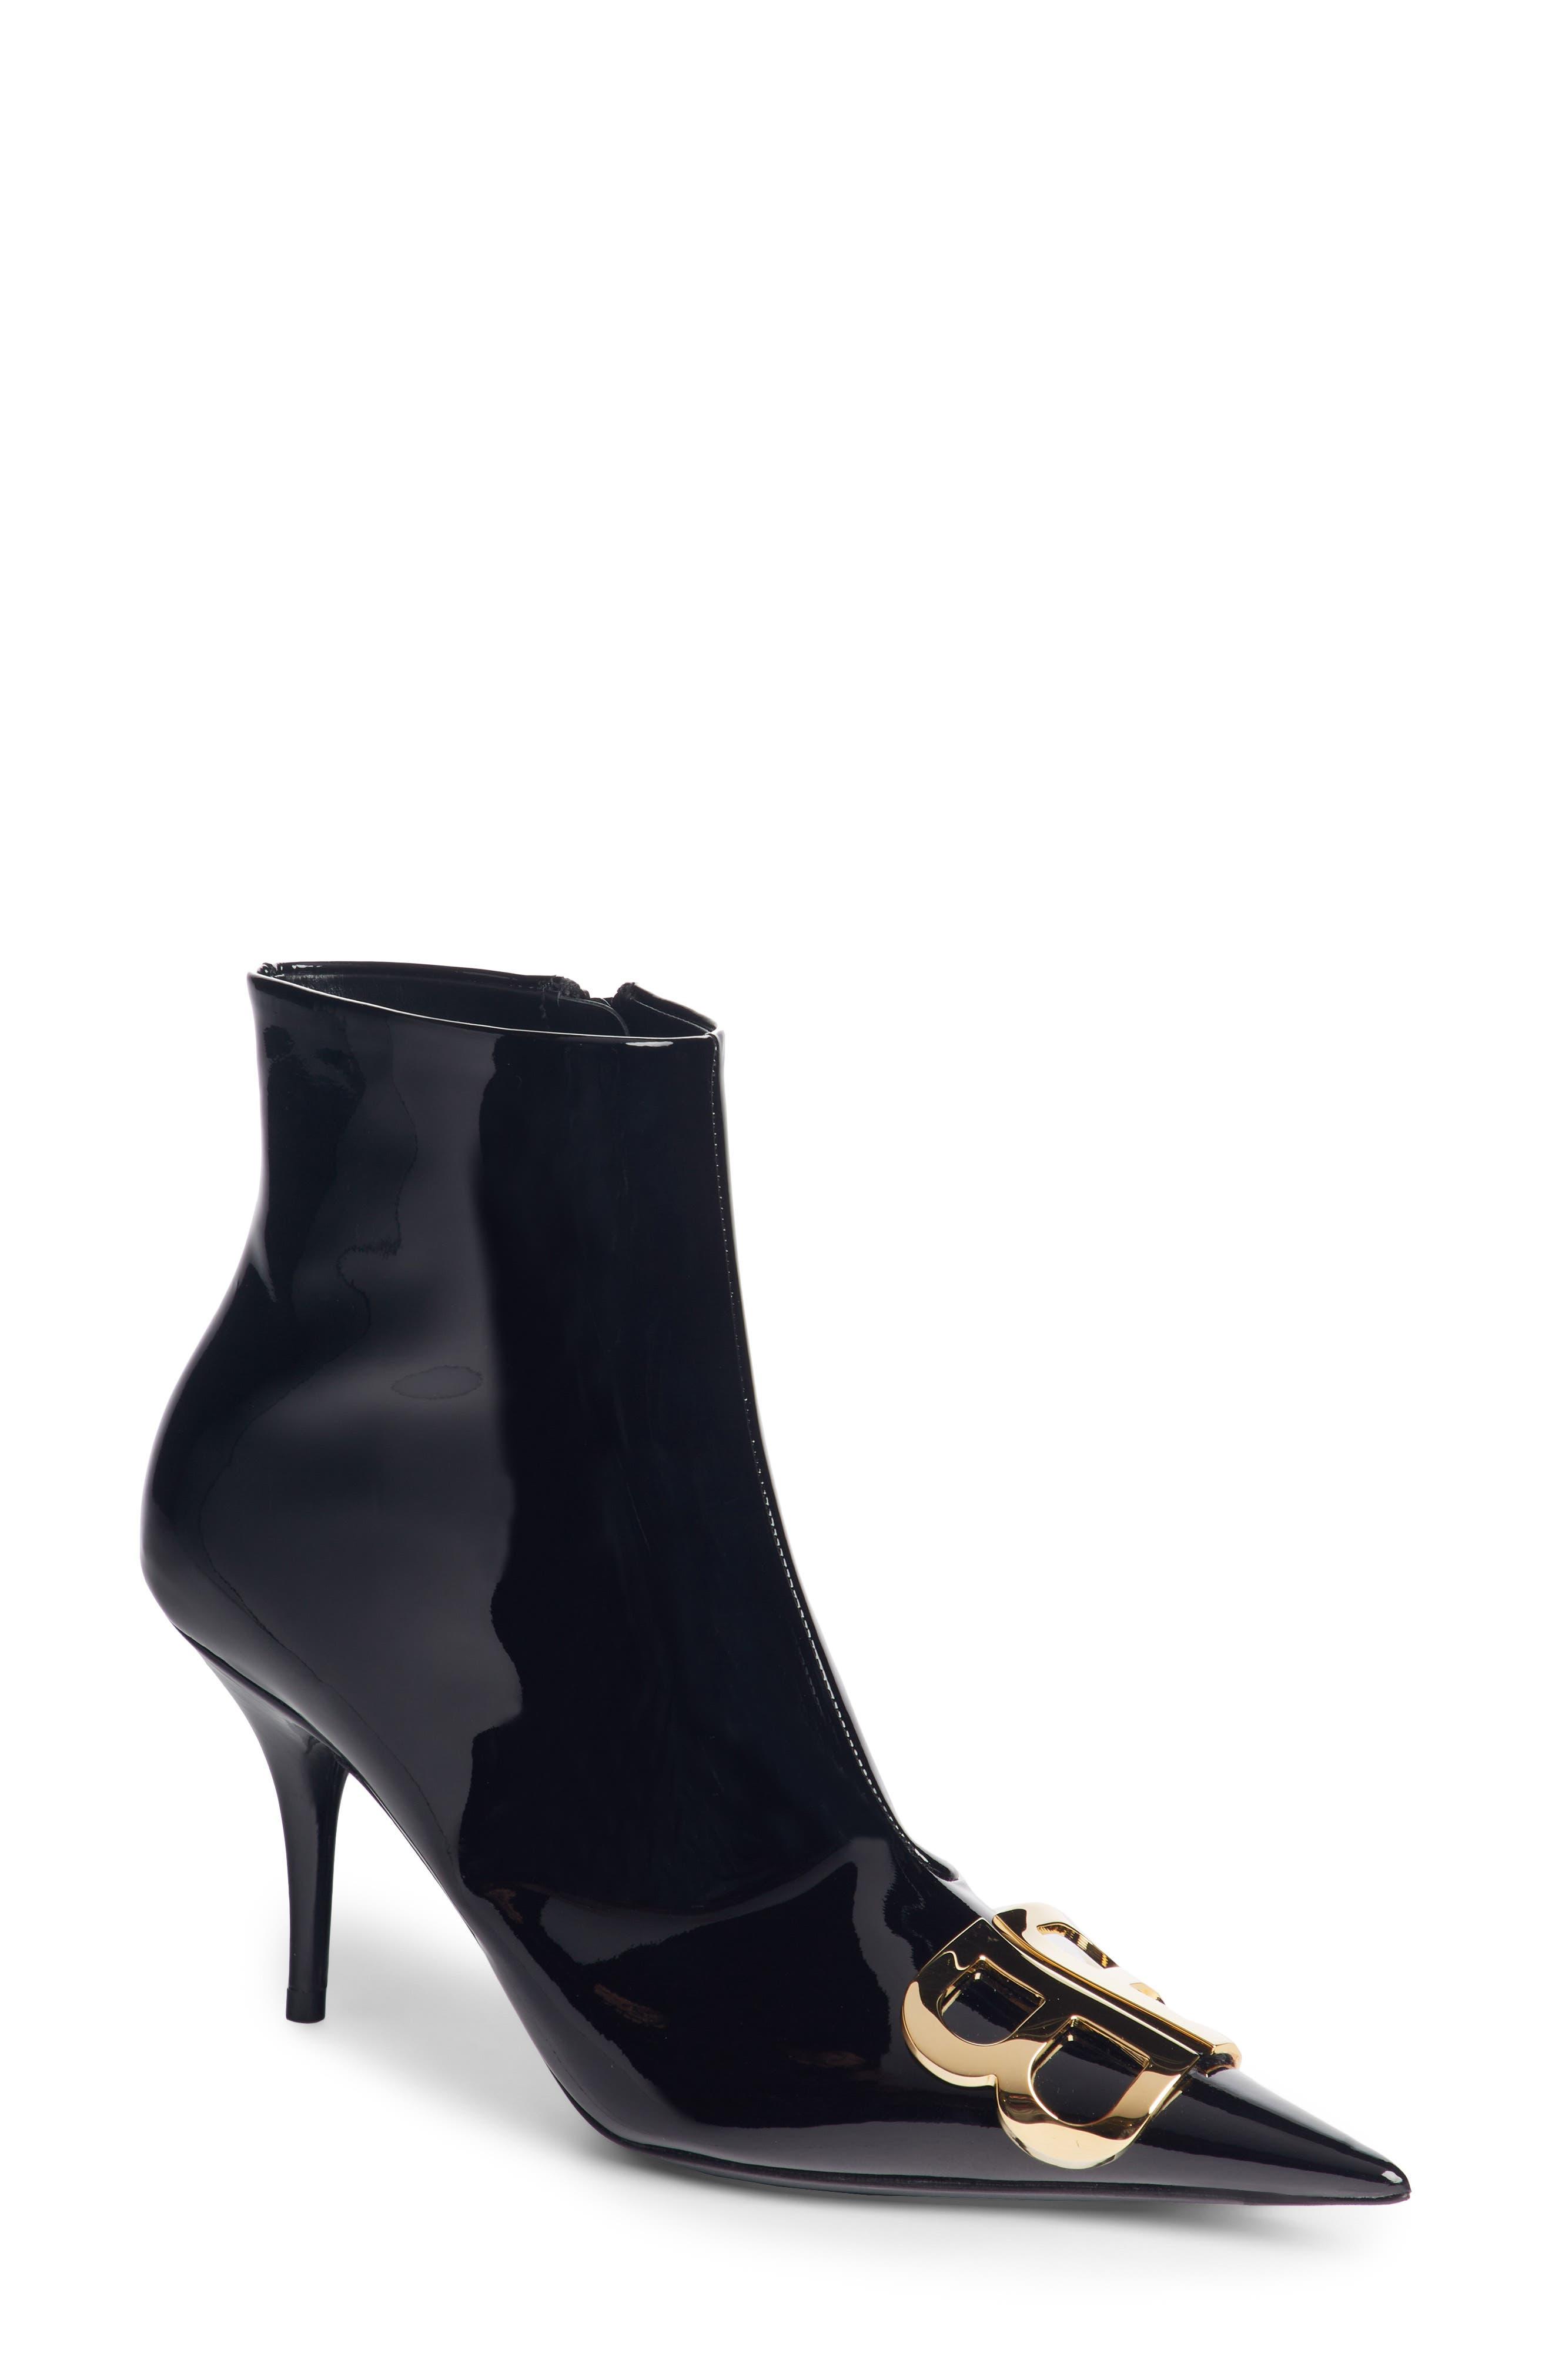 Balenciaga Bb Pointy Toe Bootie - Black